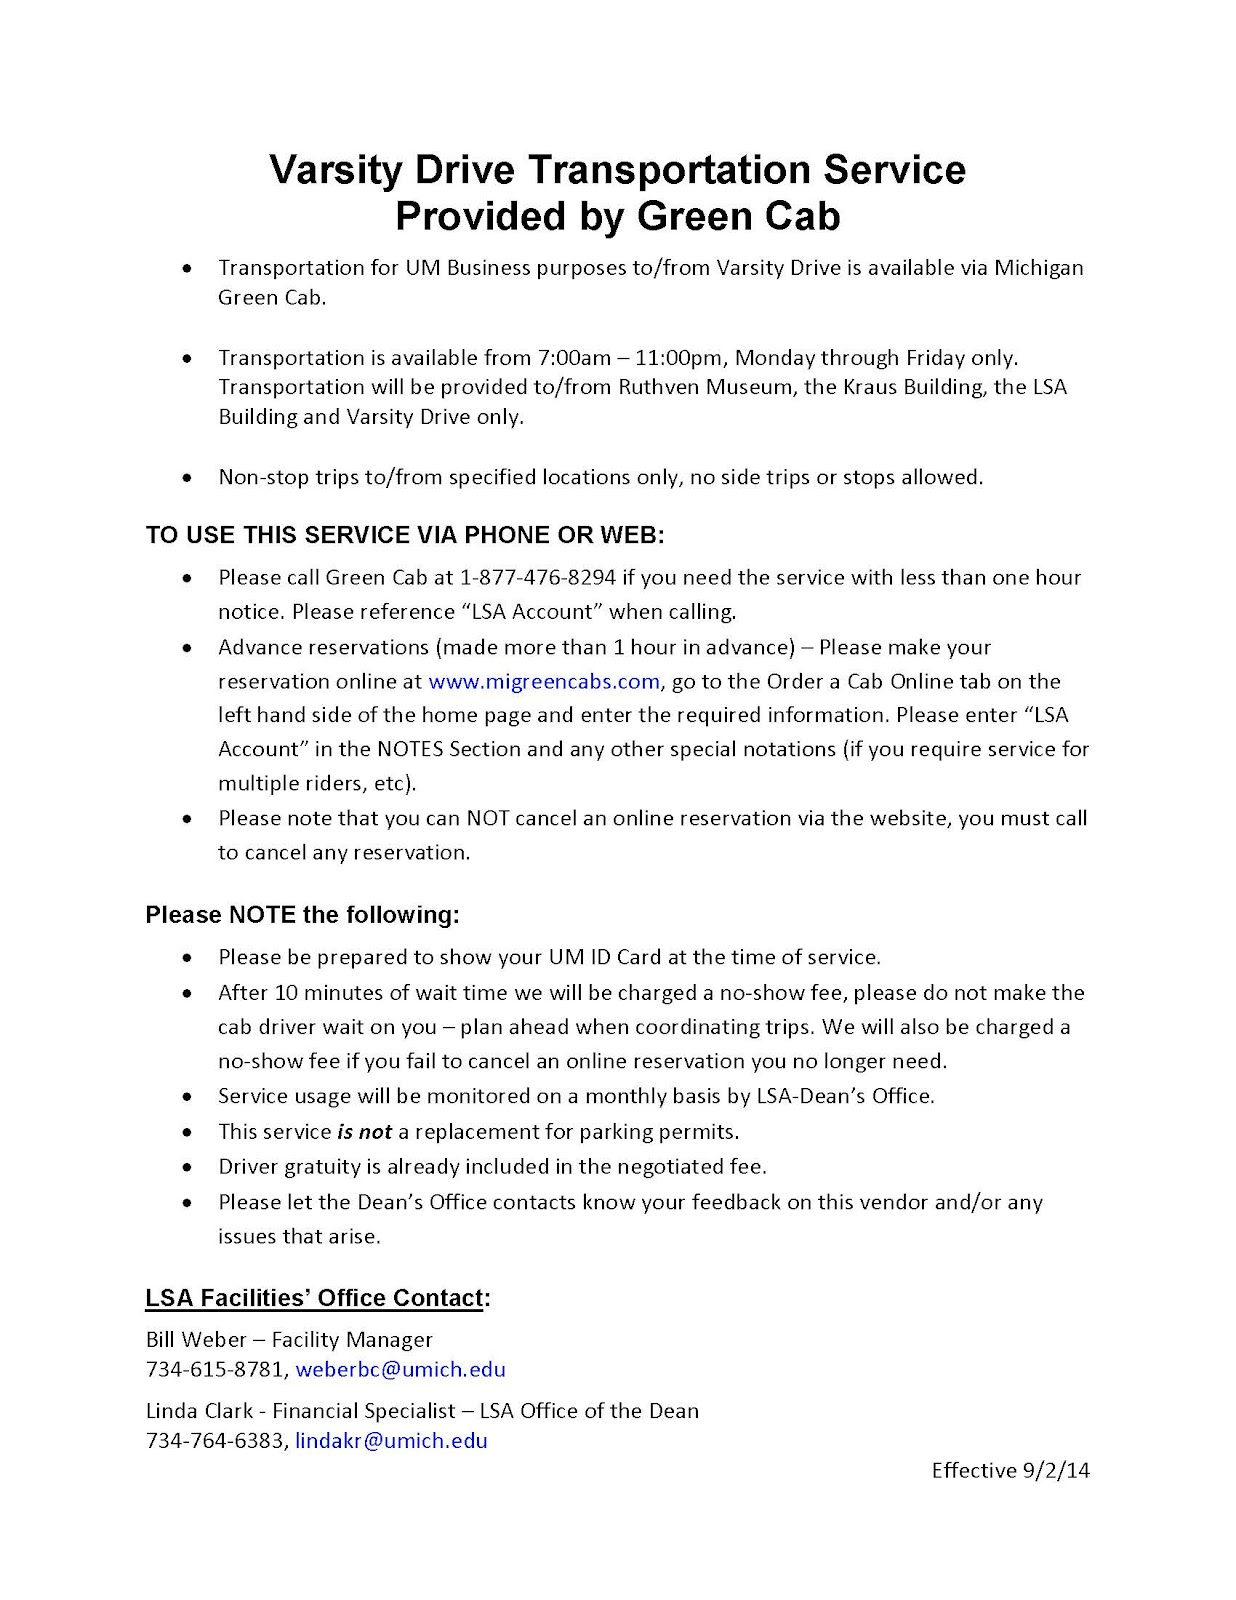 Varsity Drive Transportation - Green Cab.jpg